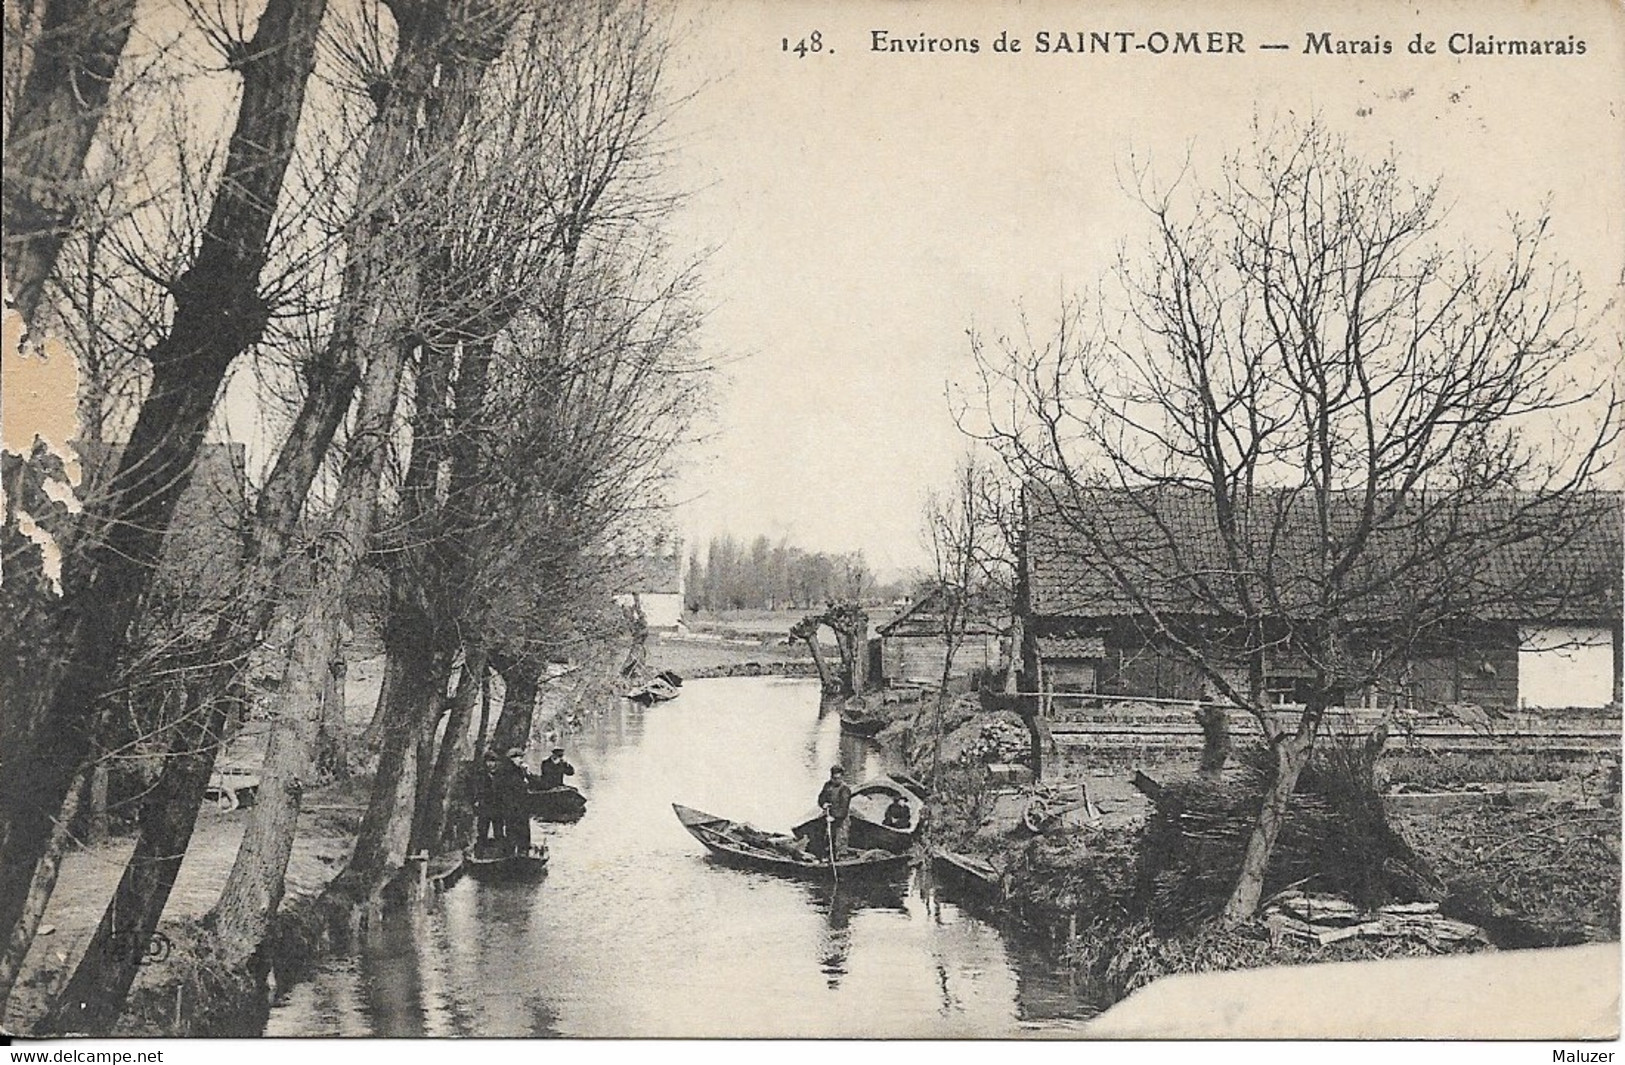 CARTE POSTALE ENVIRONS DE SAINT-OMER - MARAIS DE CLAIRMARAIS - Saint Omer